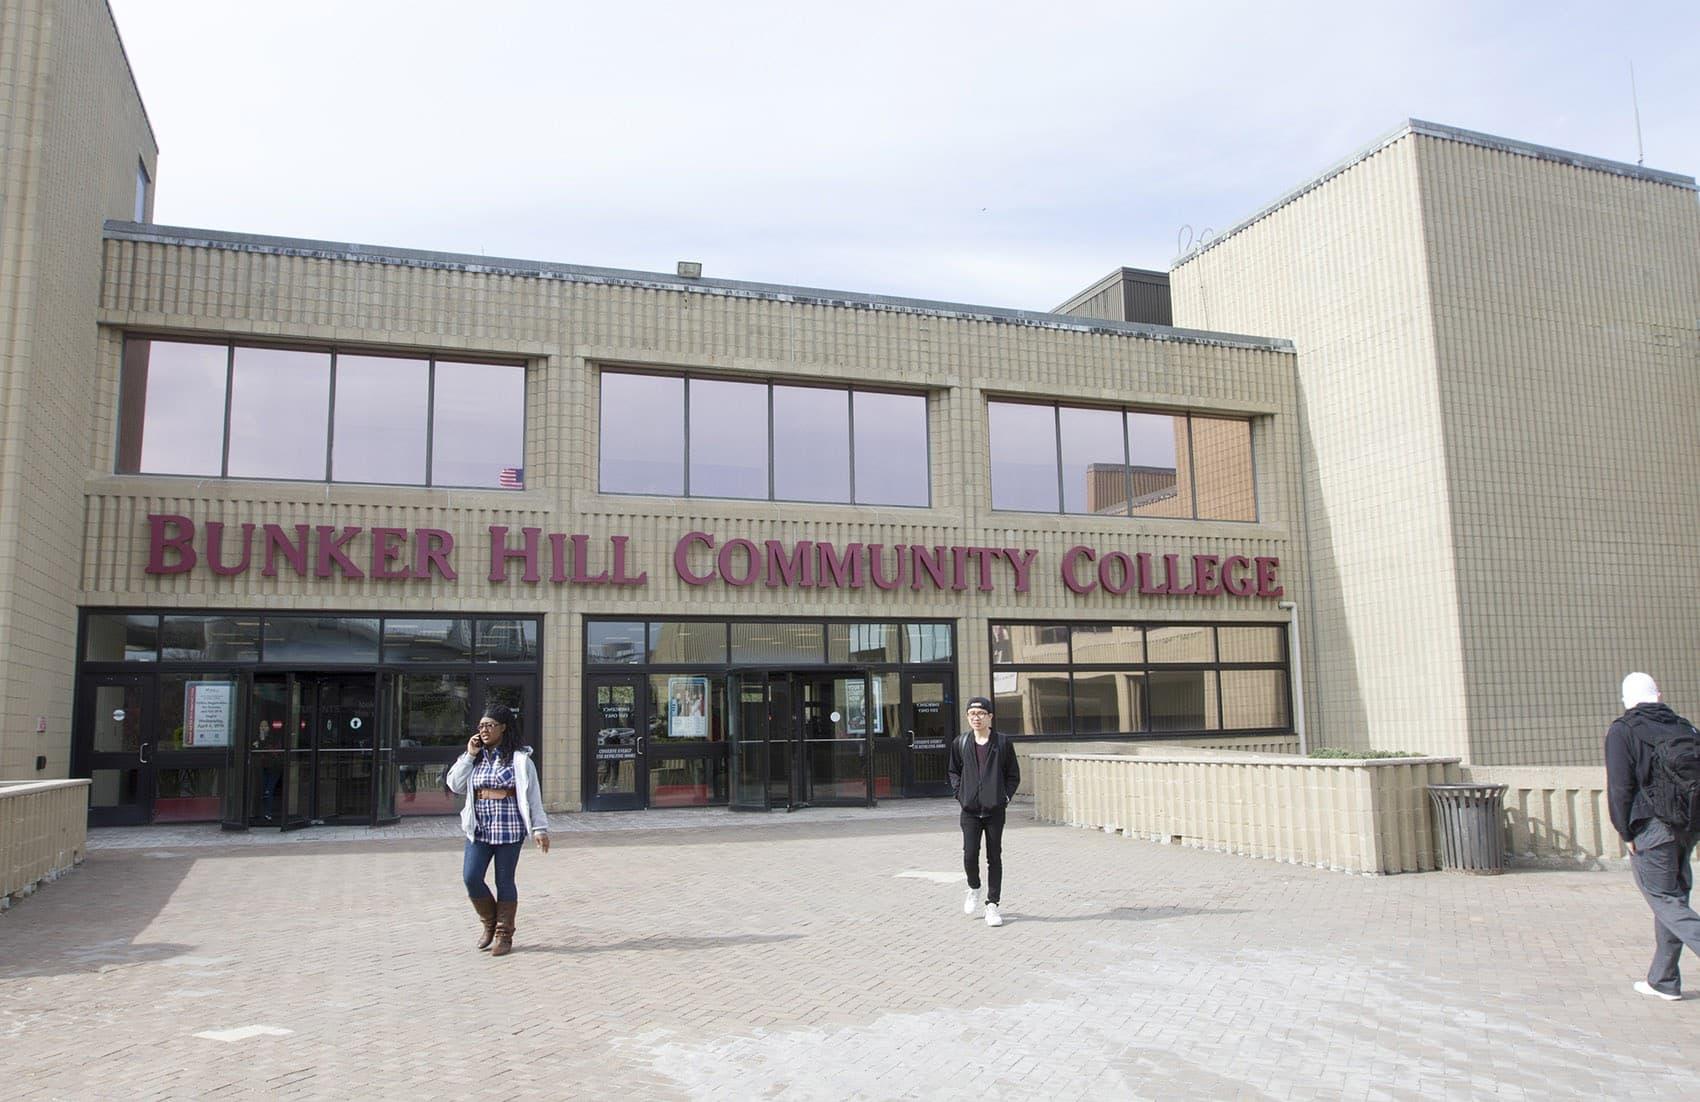 Bunker Hill Community College (Joe Difazio for WBUR)